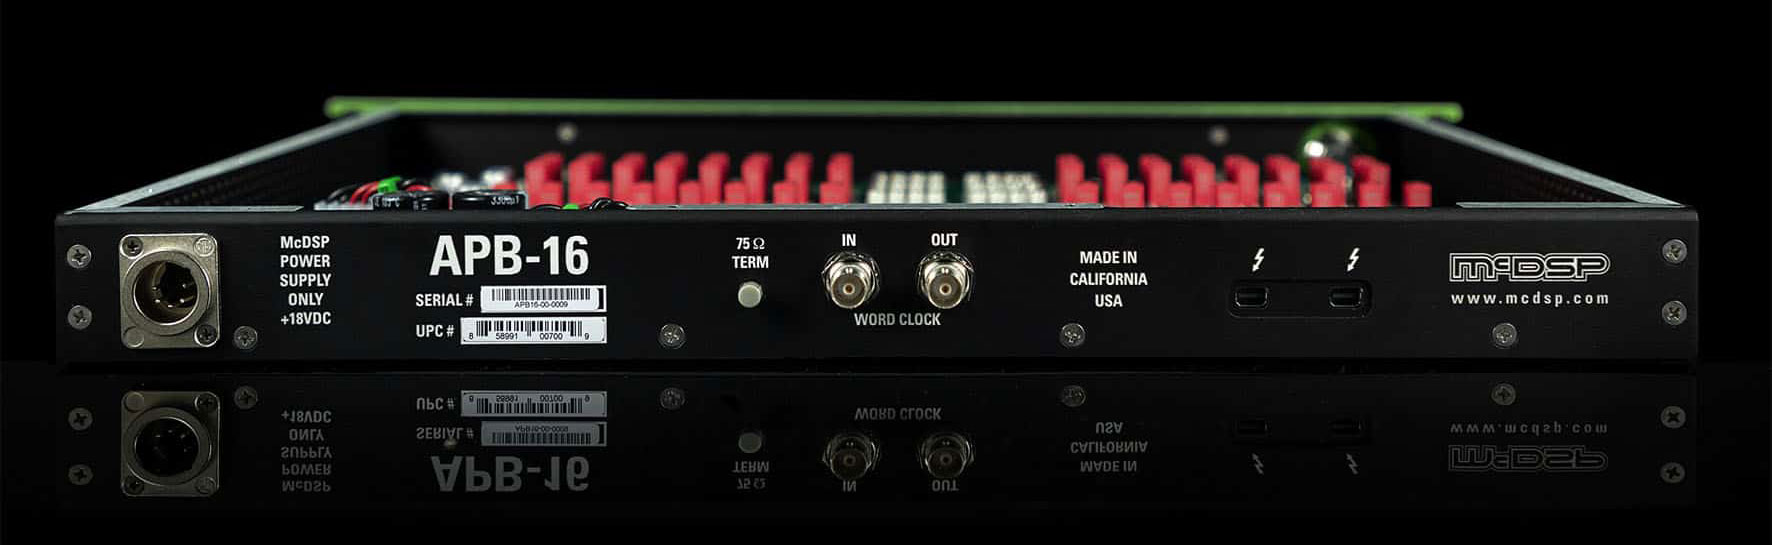 APB-Hardware_Back-Top-Off